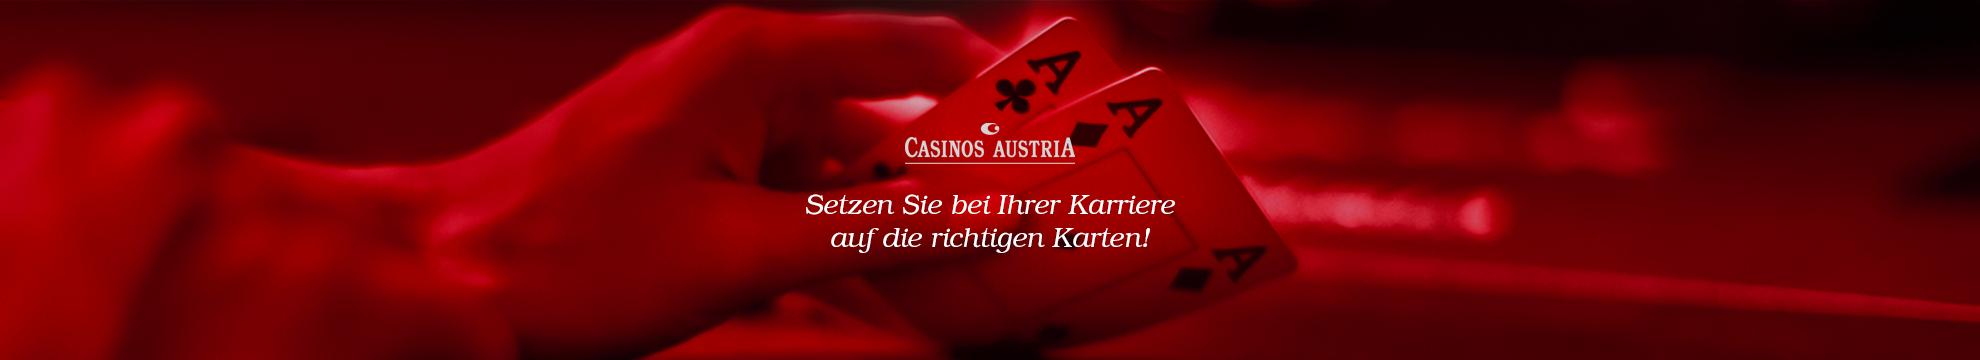 Casino Austria Standorte